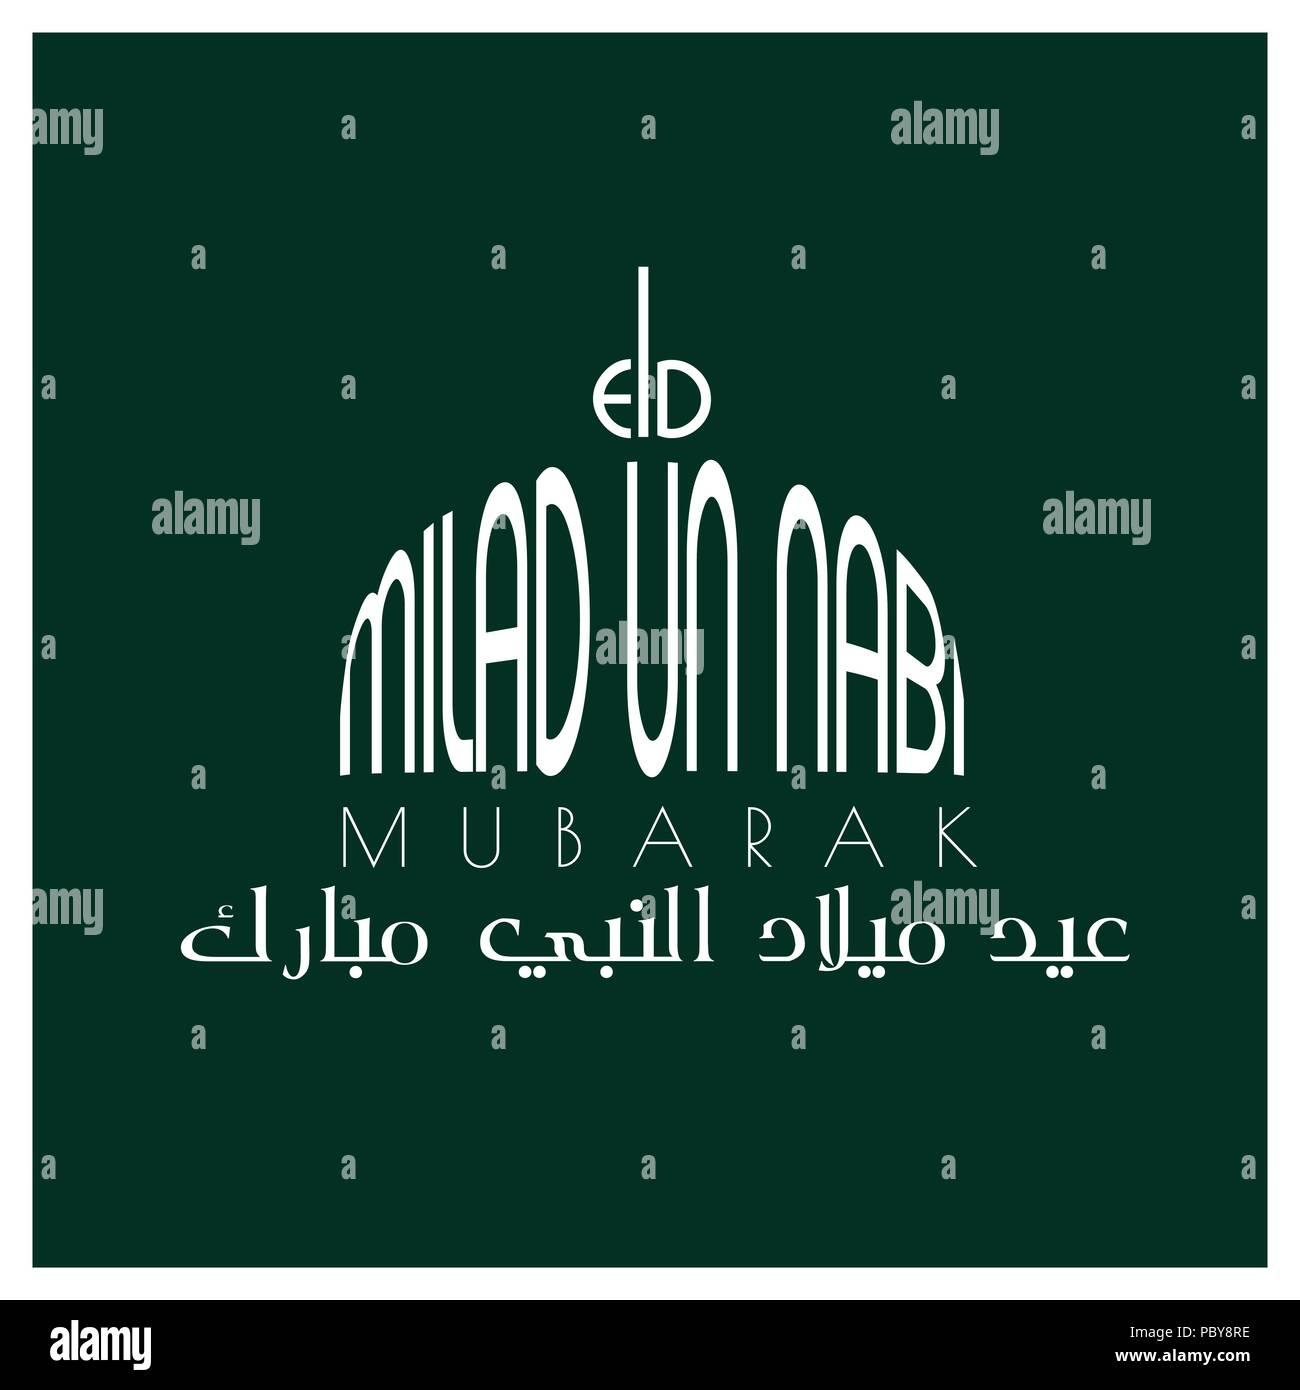 Eid Milad Un Nabi Design Card With Typography Vector Stock Vector